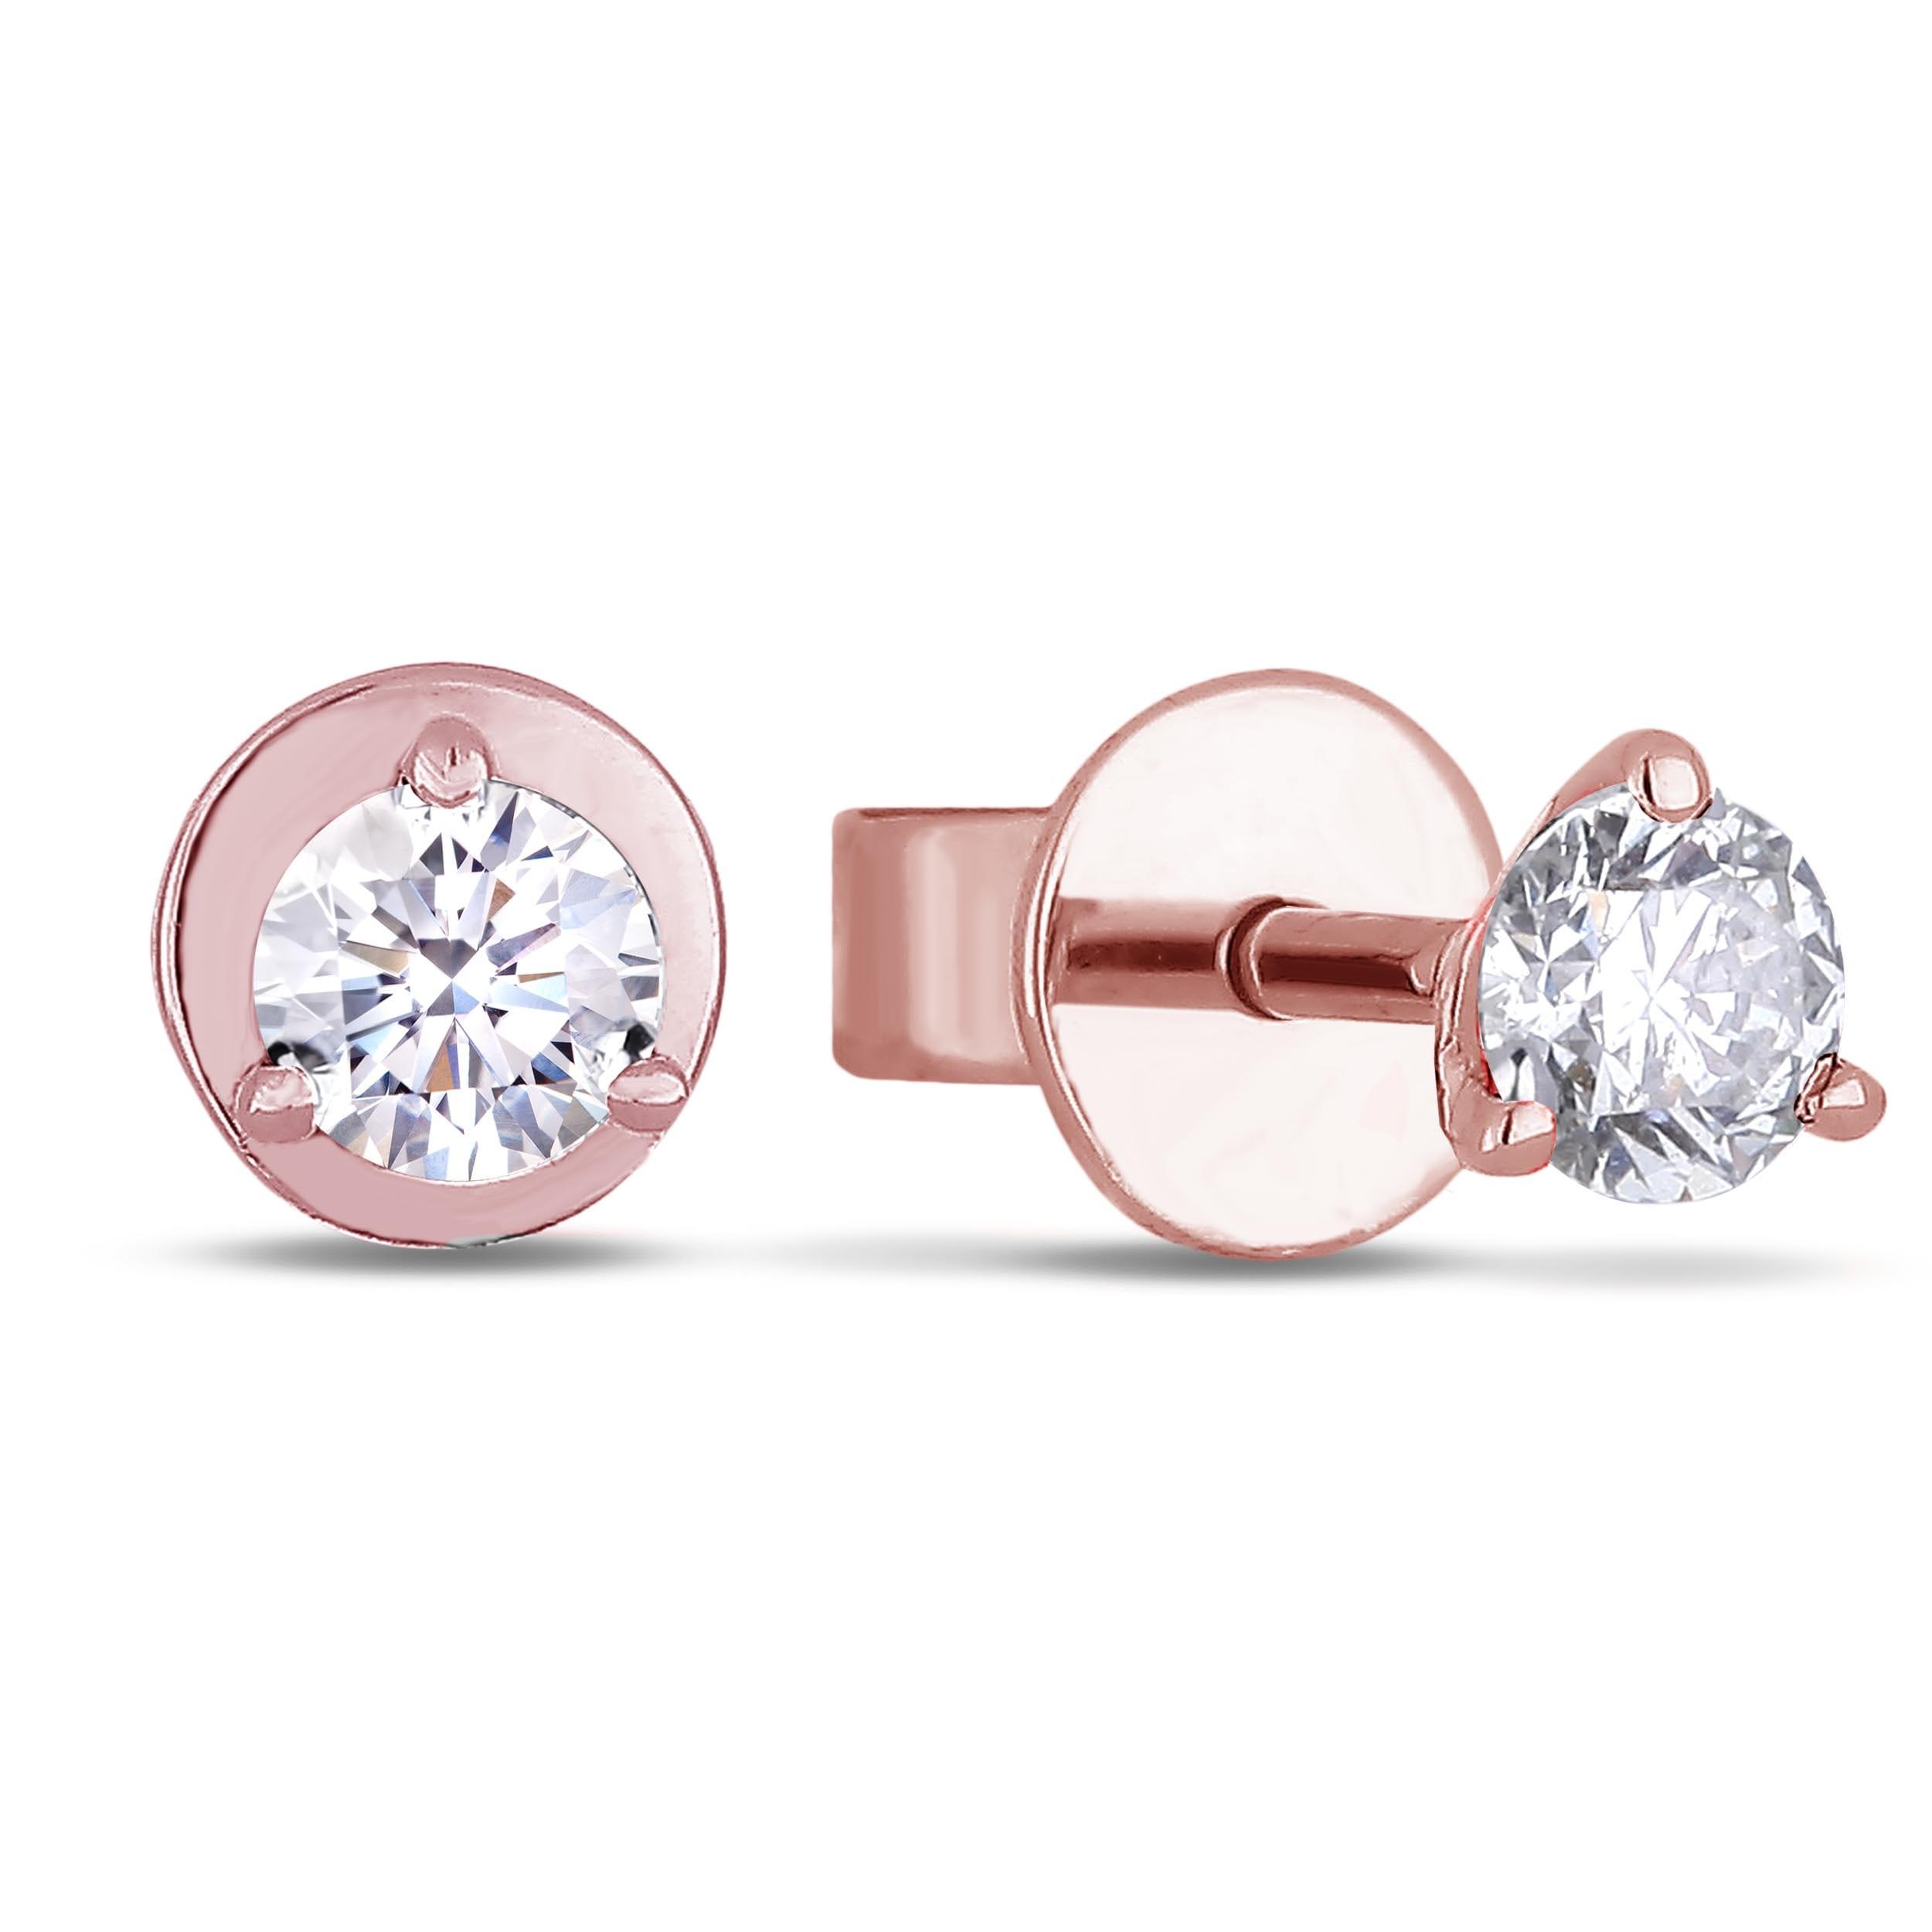 Diamond Stud Earrings In 14k Rose Gold Lugaro Jewellery